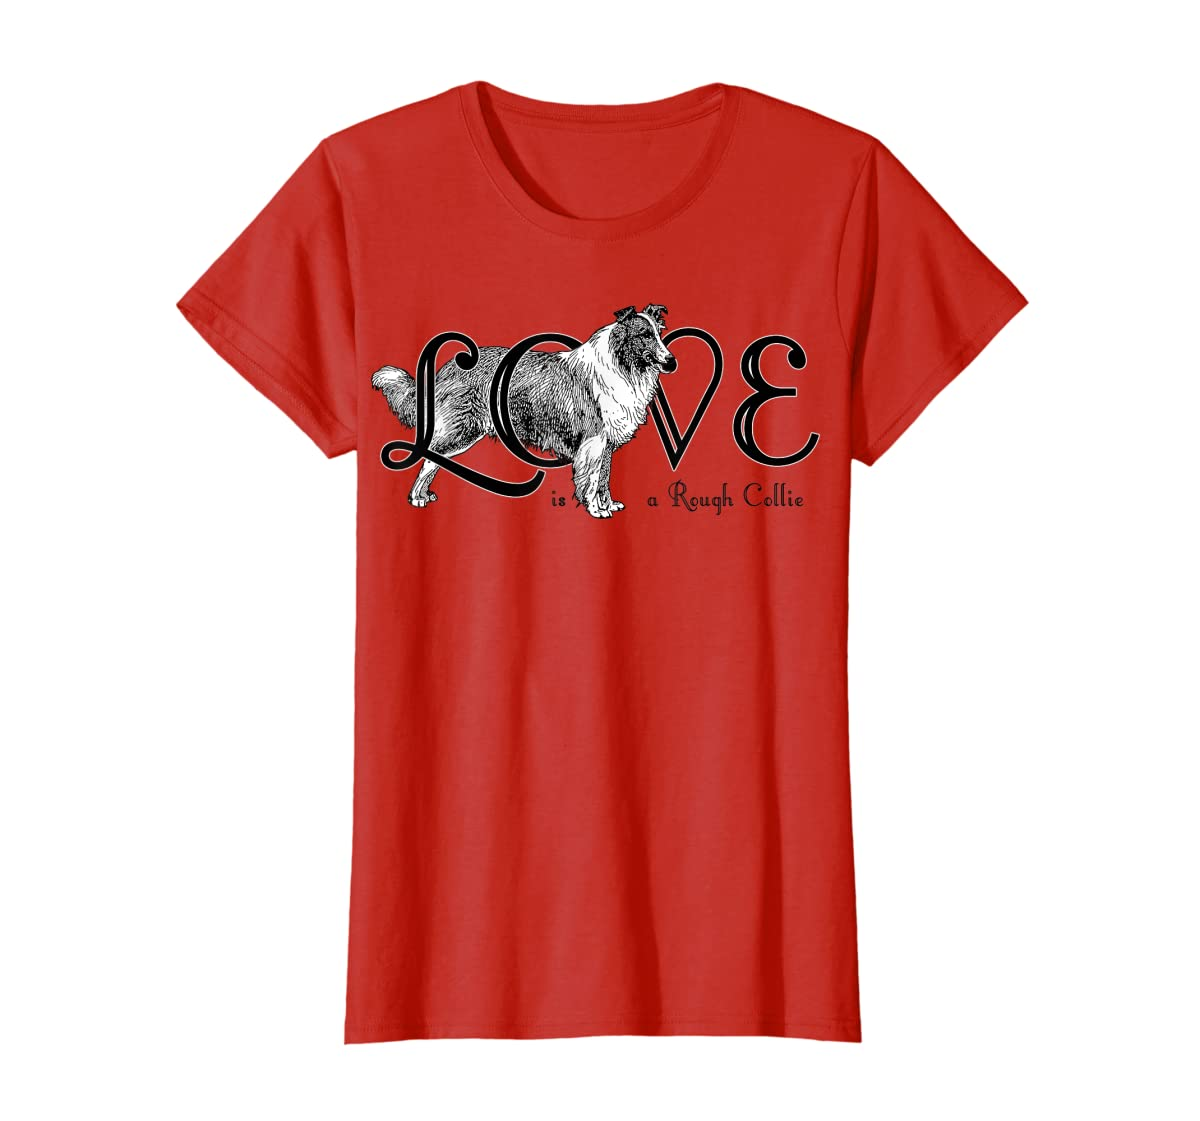 Love is a Rough Collie T-Shirt-Women's T-Shirt-Red